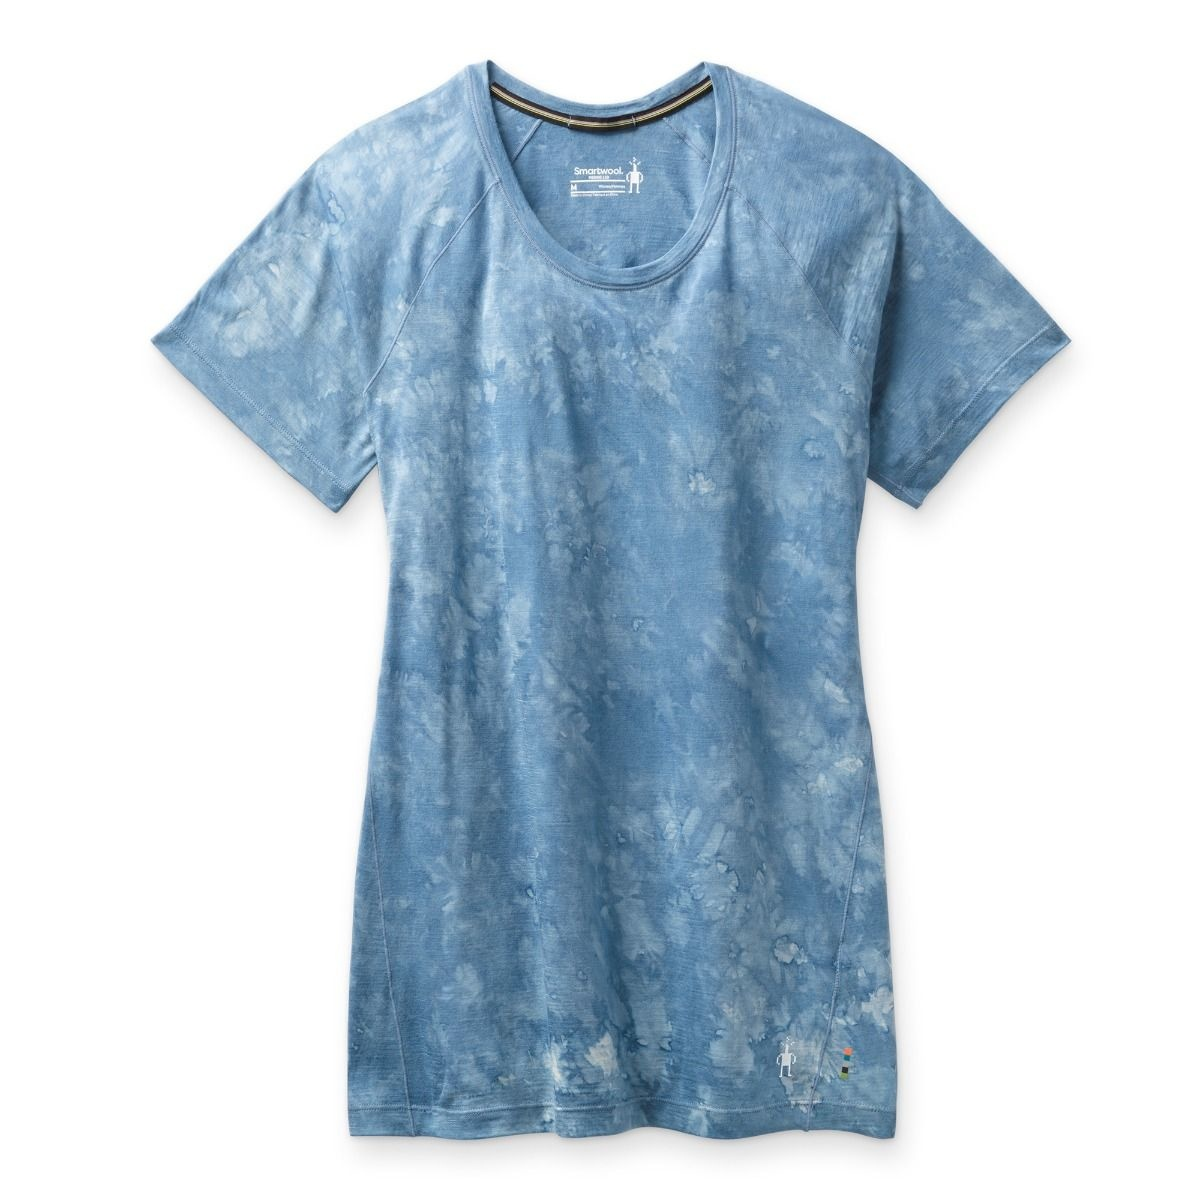 W Merino 150 SS, Blue Wash